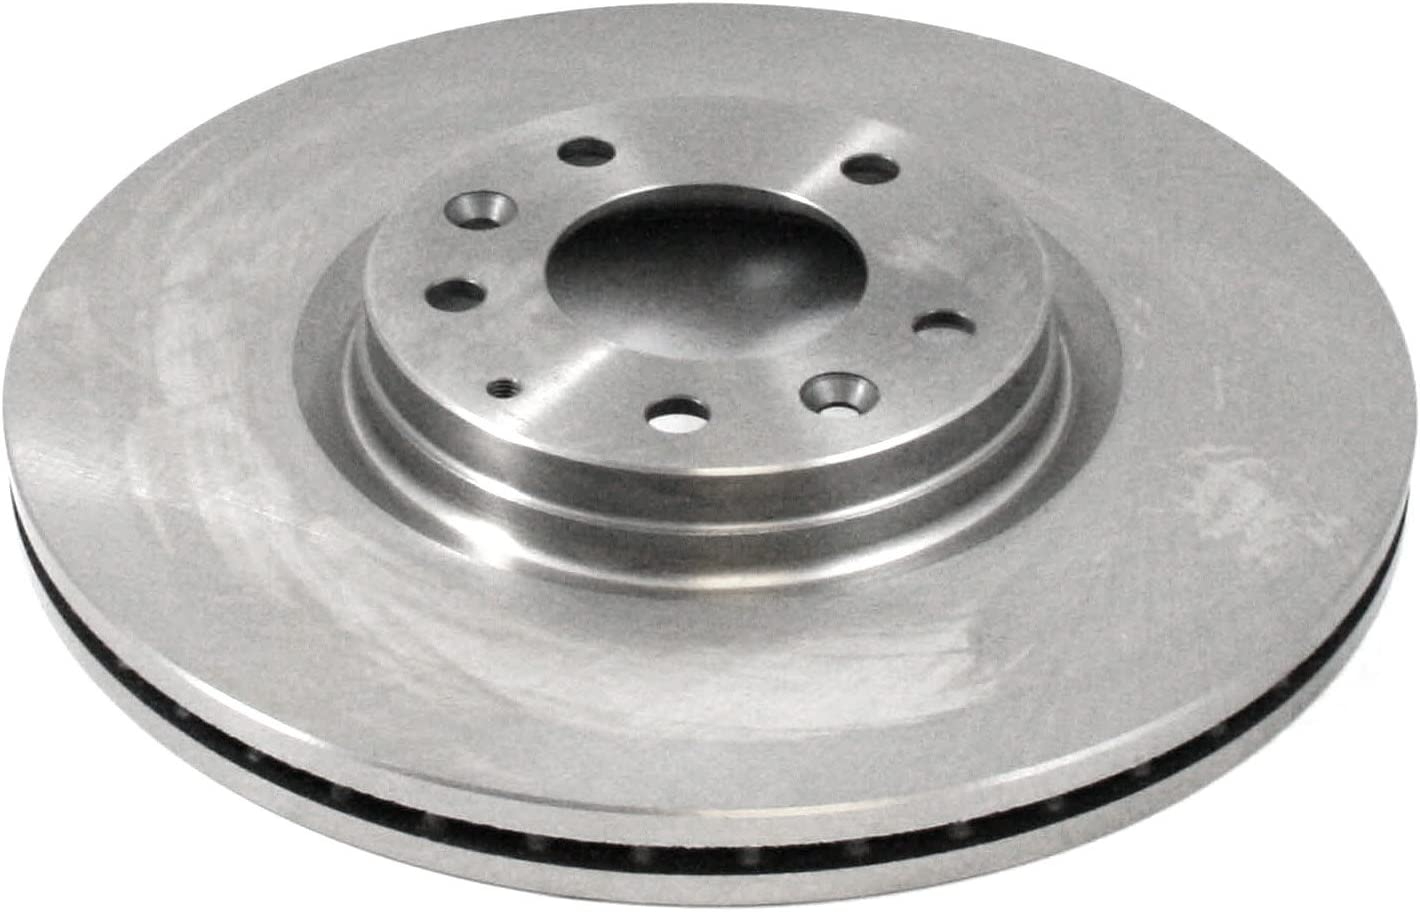 DuraGo BR900454 Front Vented Disc Brake Rotor